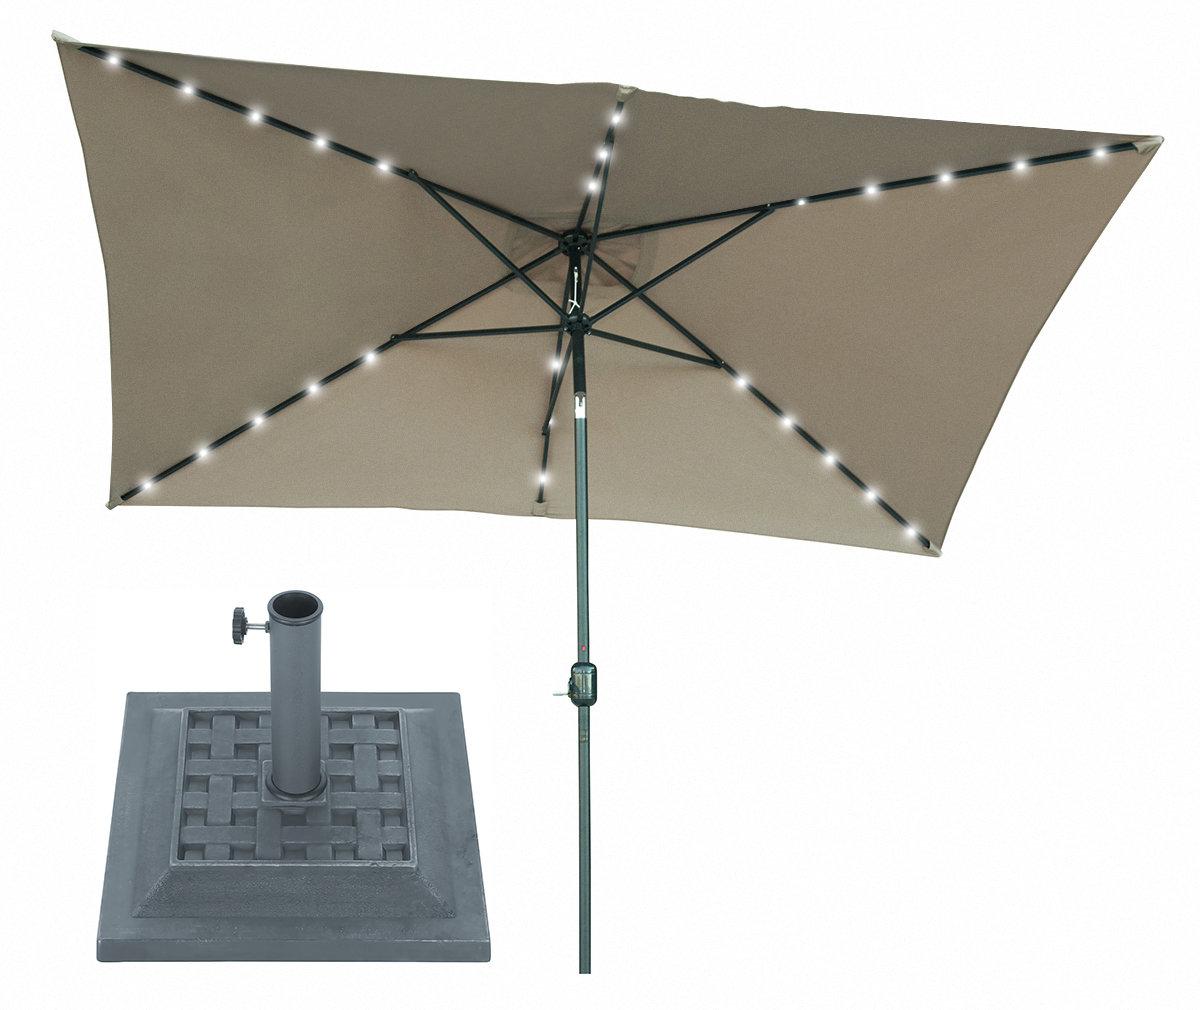 Bramblett 10' X 6.5' Rectangular Lighted Umbrella Intended For Most Recently Released Bonita Rectangular Market Umbrellas (Gallery 11 of 20)